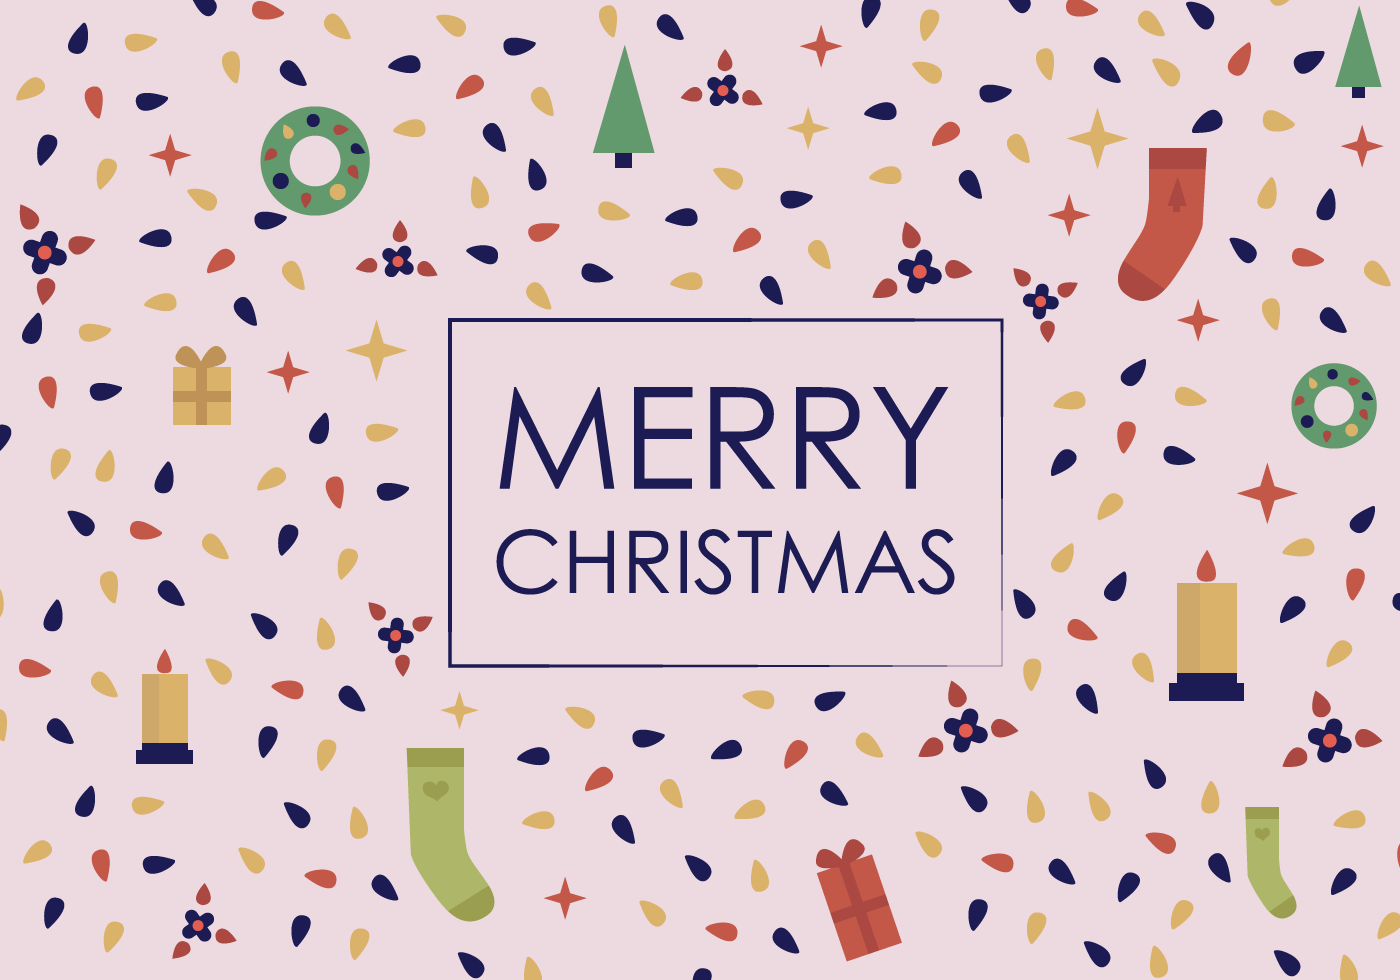 Free Merry Christmas Vector